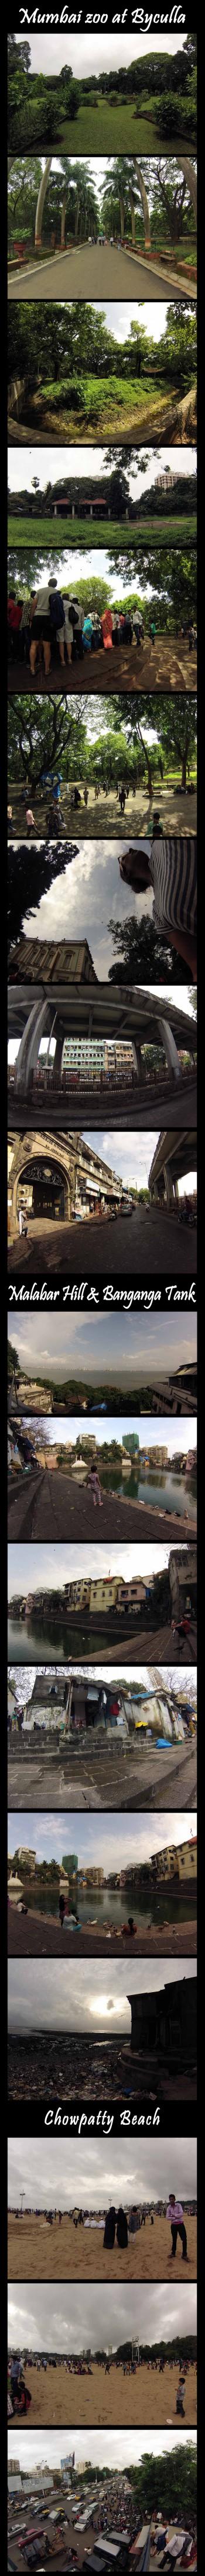 Inde,Mumbai,zoo,Byculla,Malabar Hill,Chowpatty Beach,banganga tank,Marine Drive,musulmans,Eid